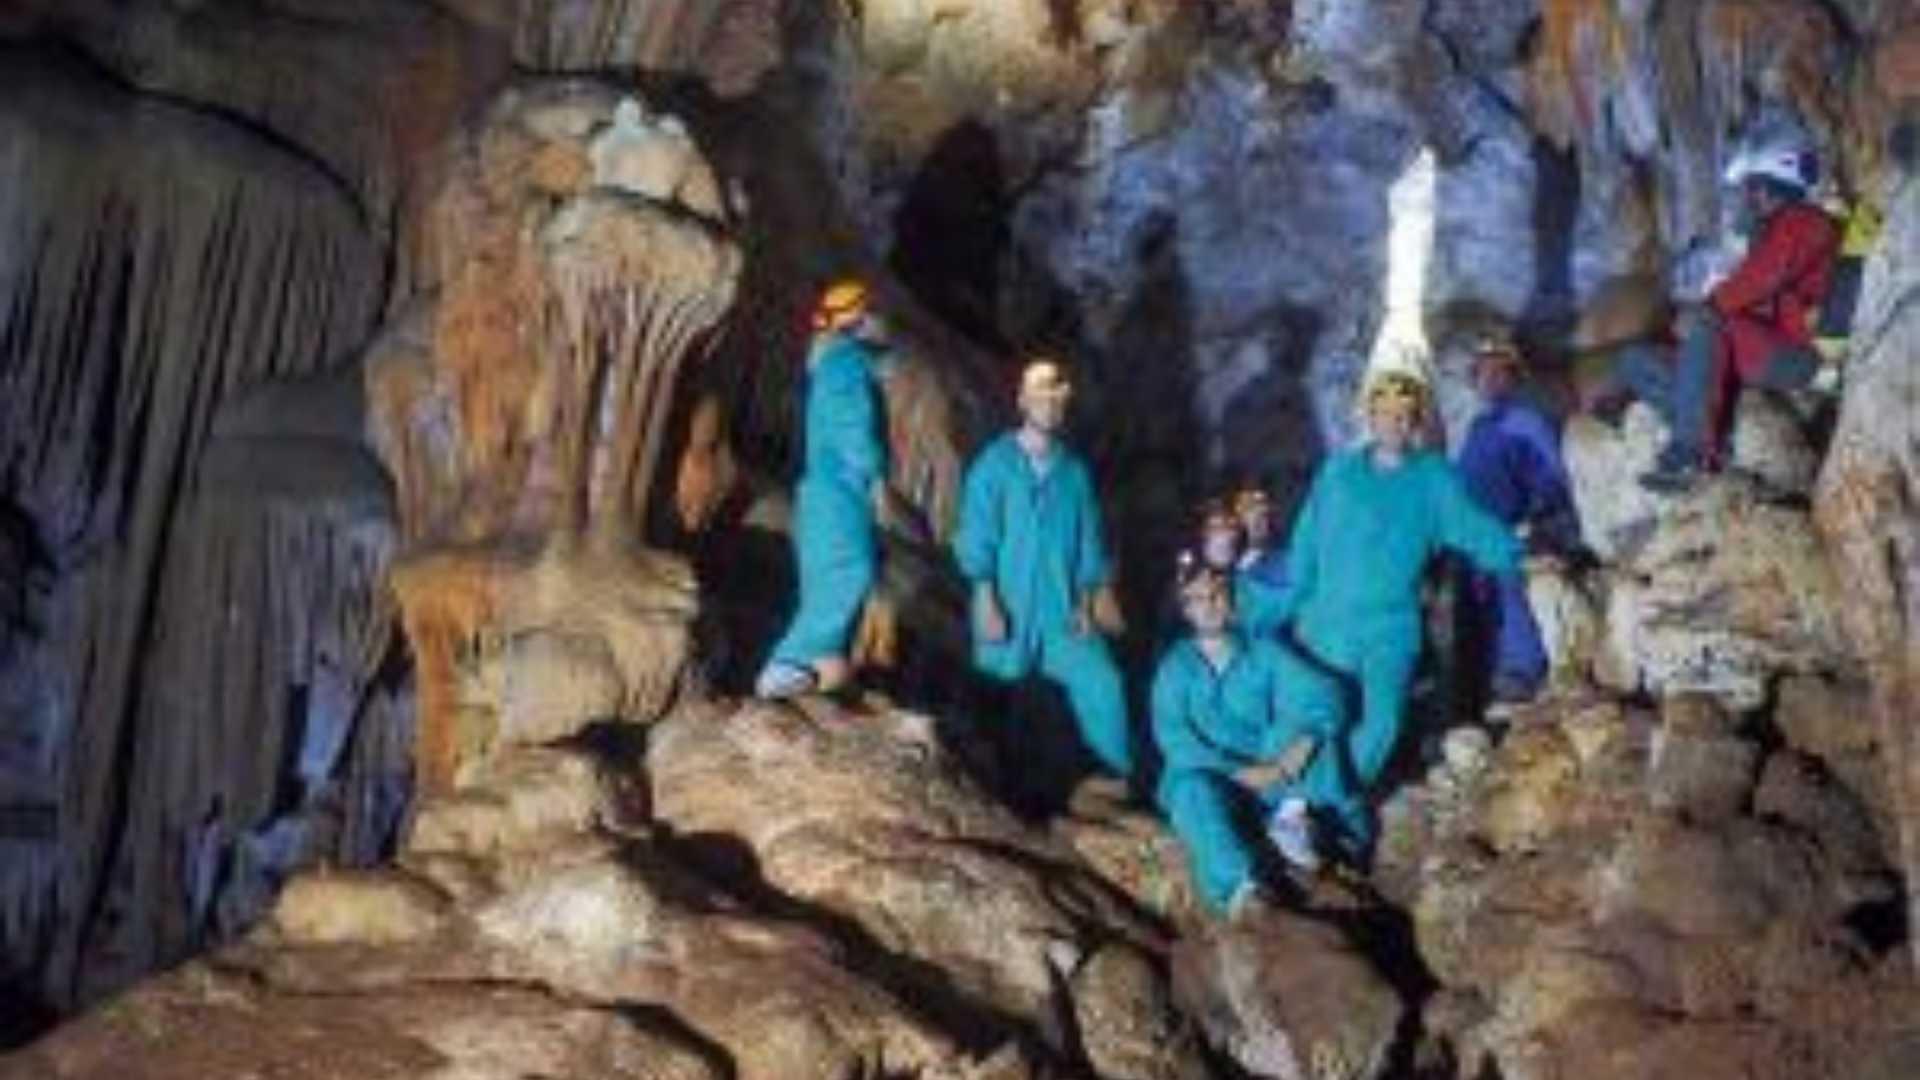 Caving - an underground adventure